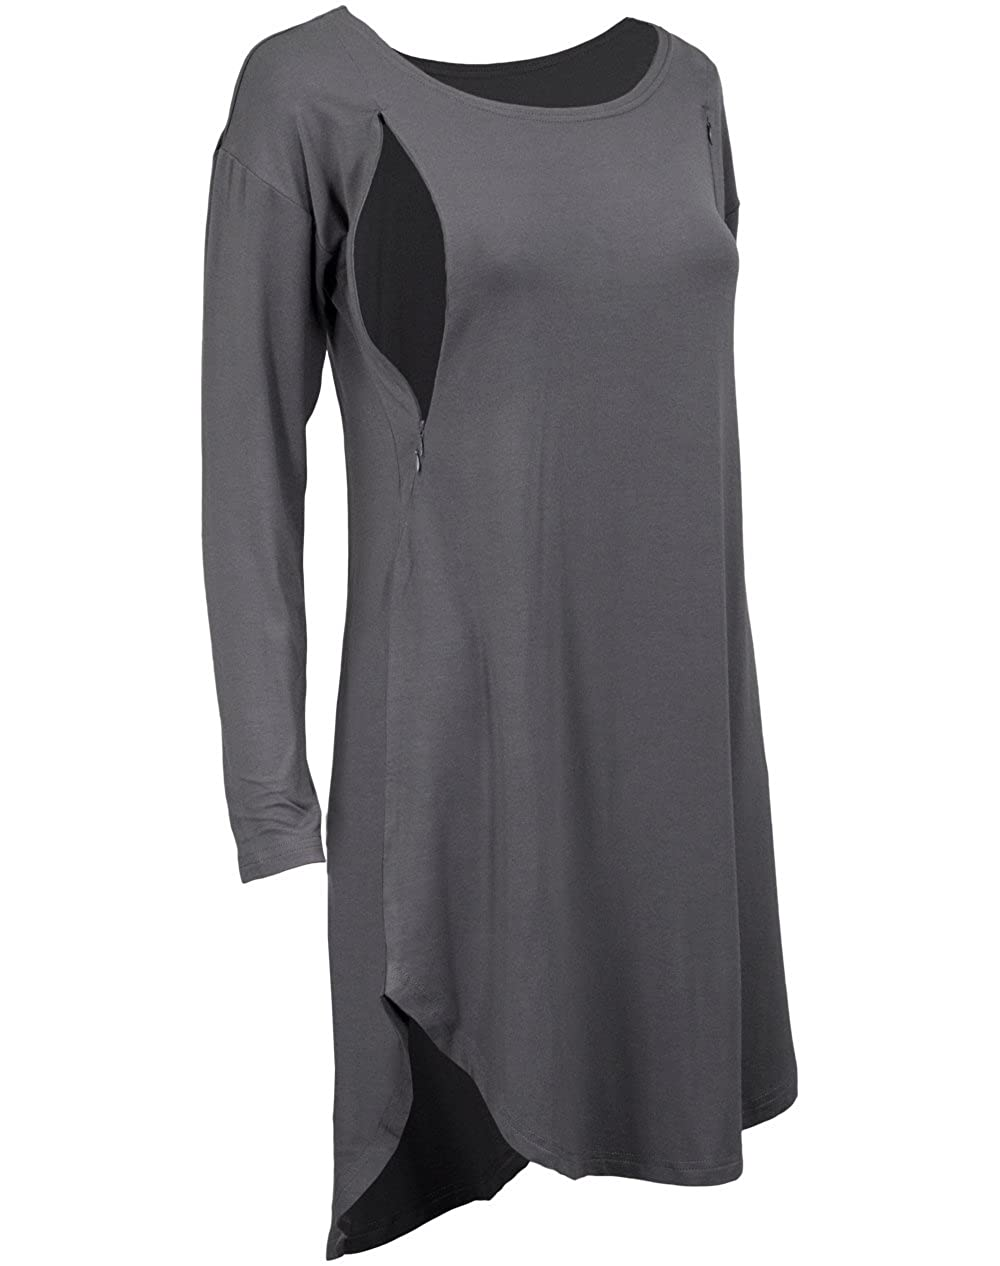 af5d610b181bb La Mere Women's Long Nursing Tunic (X-Large, Gray) at Amazon Women's  Clothing store: